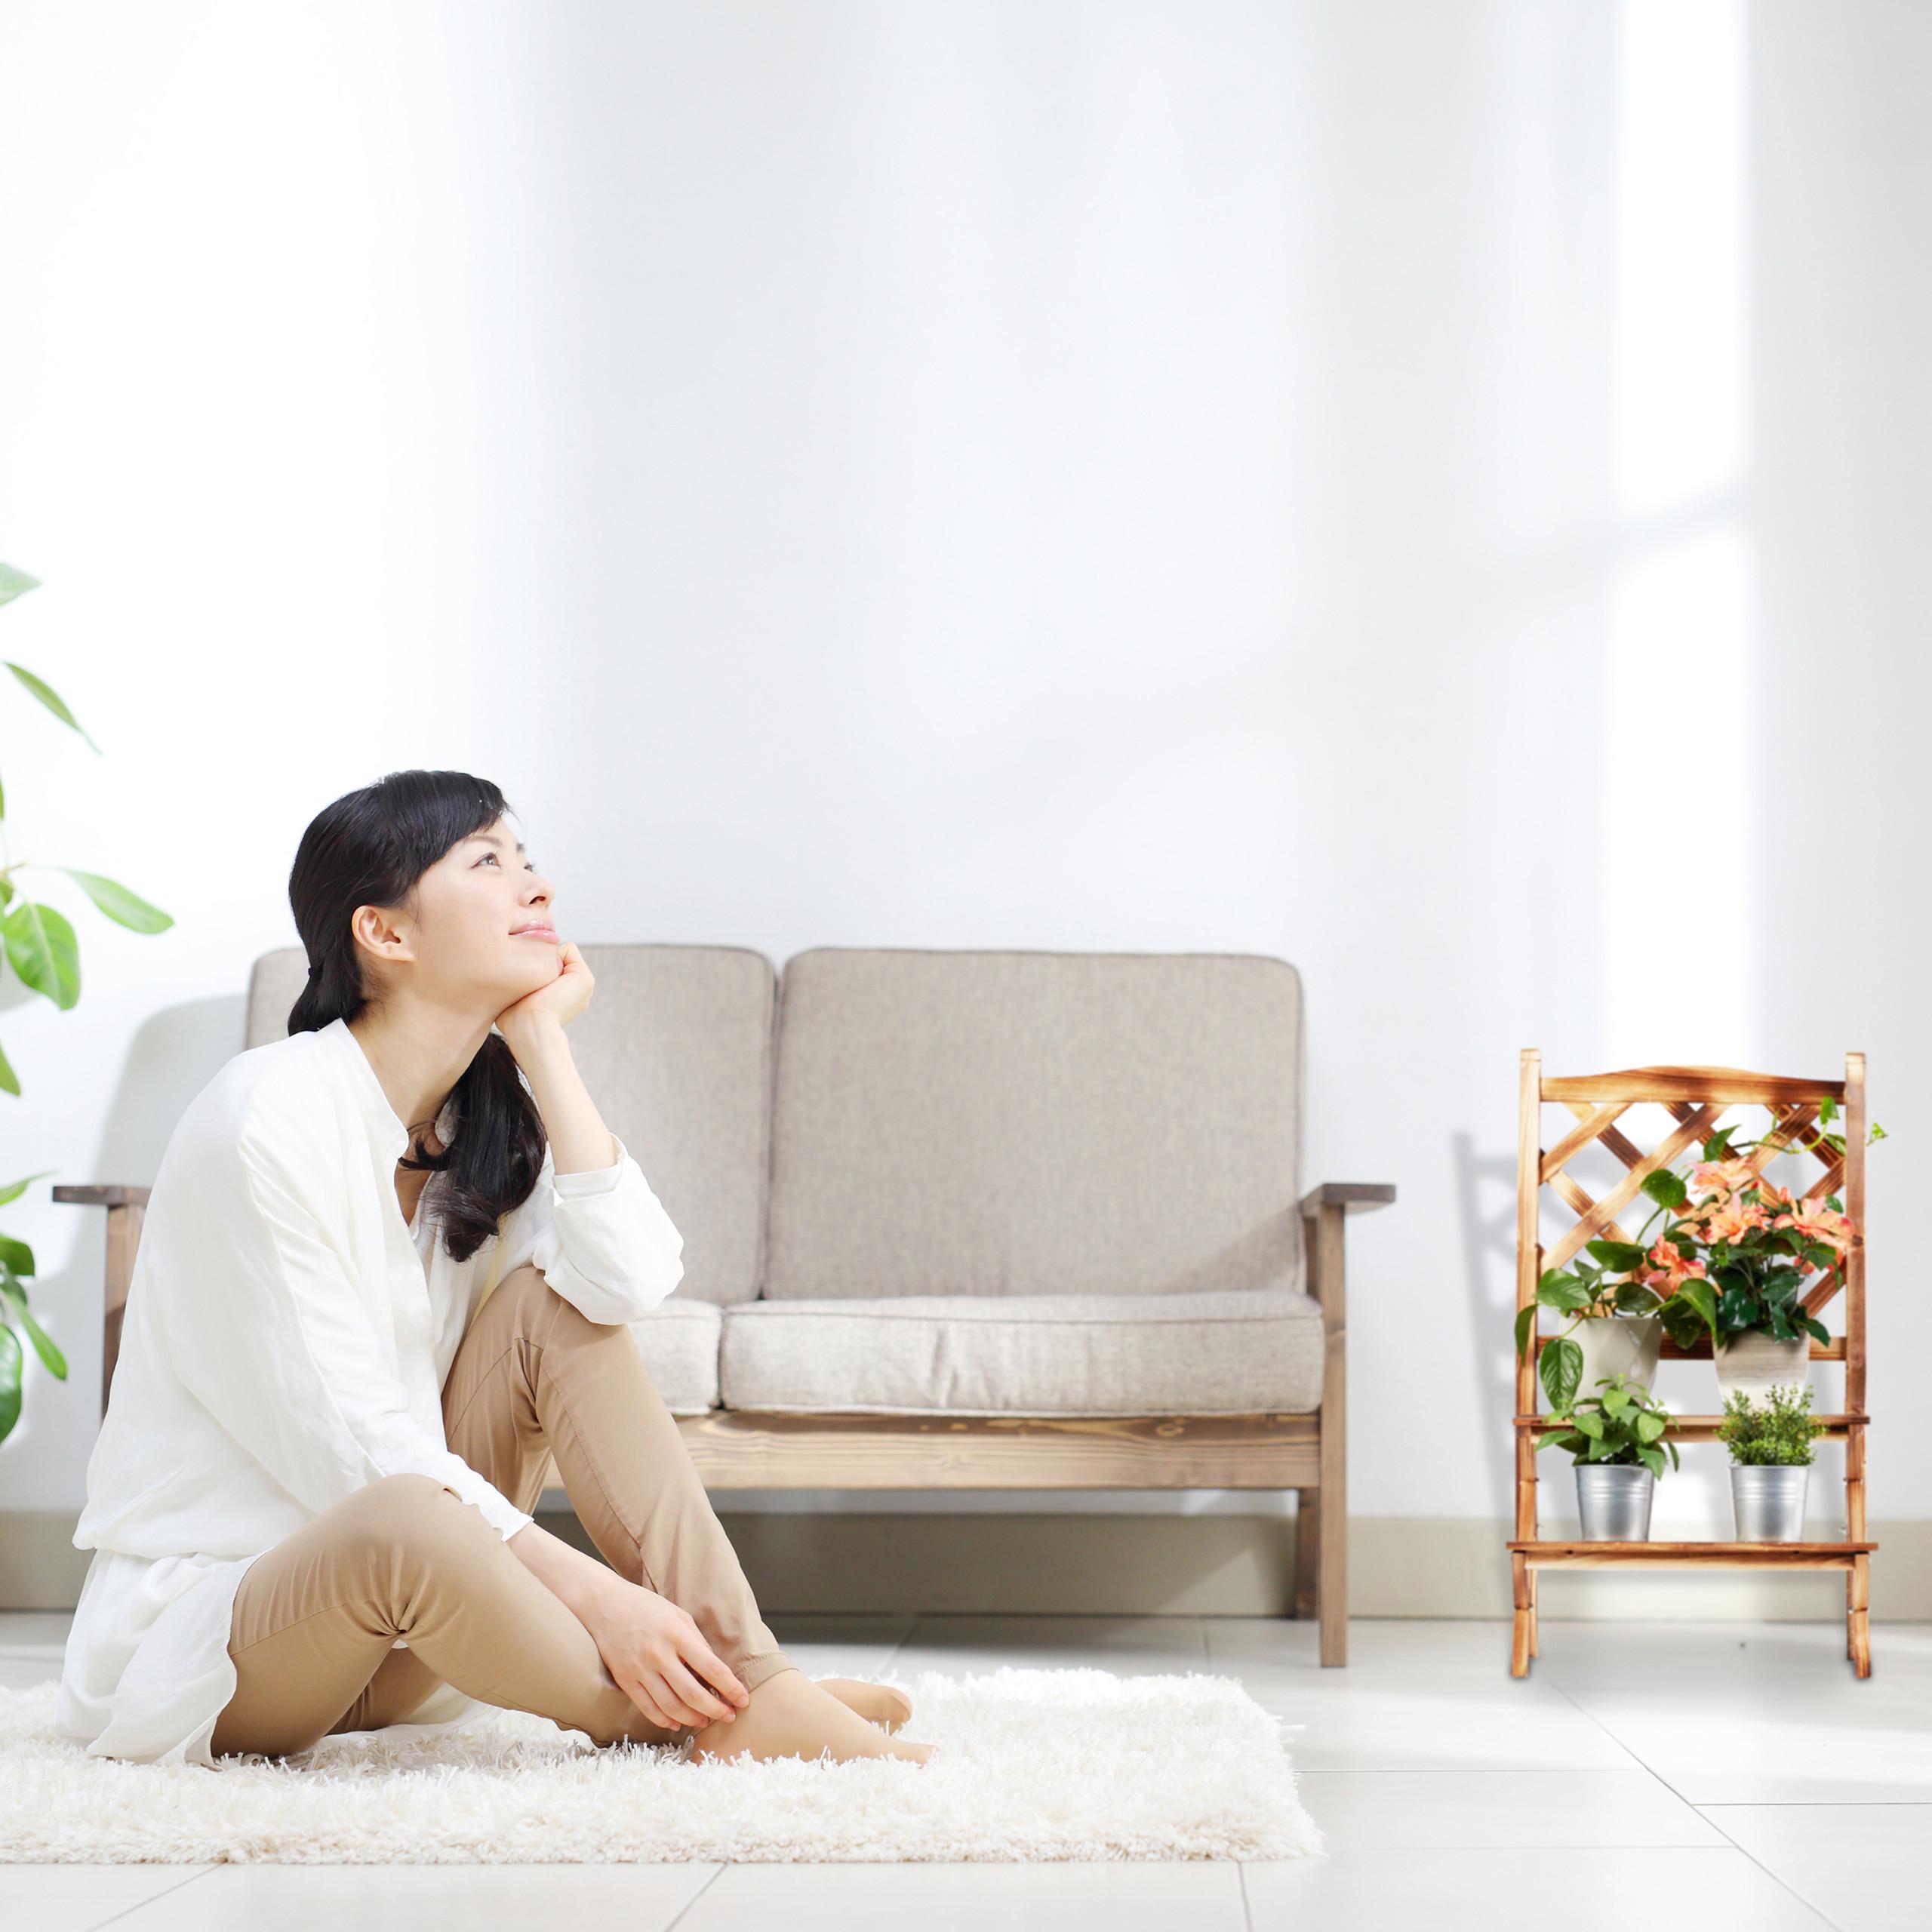 plantenrek-hout-plantentrap-plantenklimrek-bloemenrek-bloementrap miniatuur 11